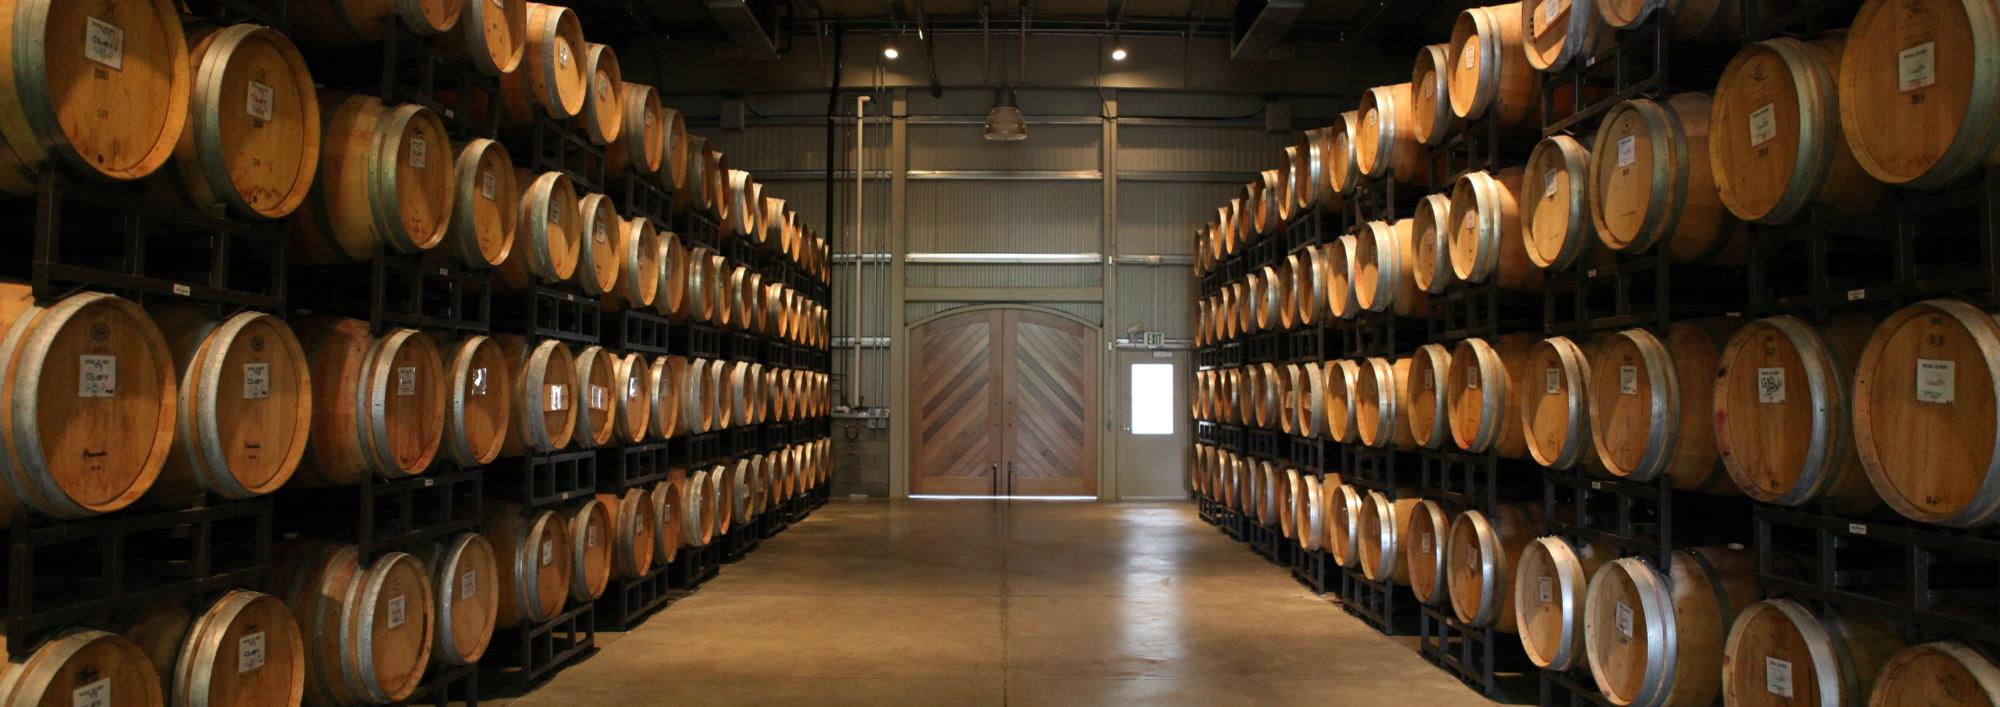 Alternative Investments, Expert Opinion, Wine, Luxury